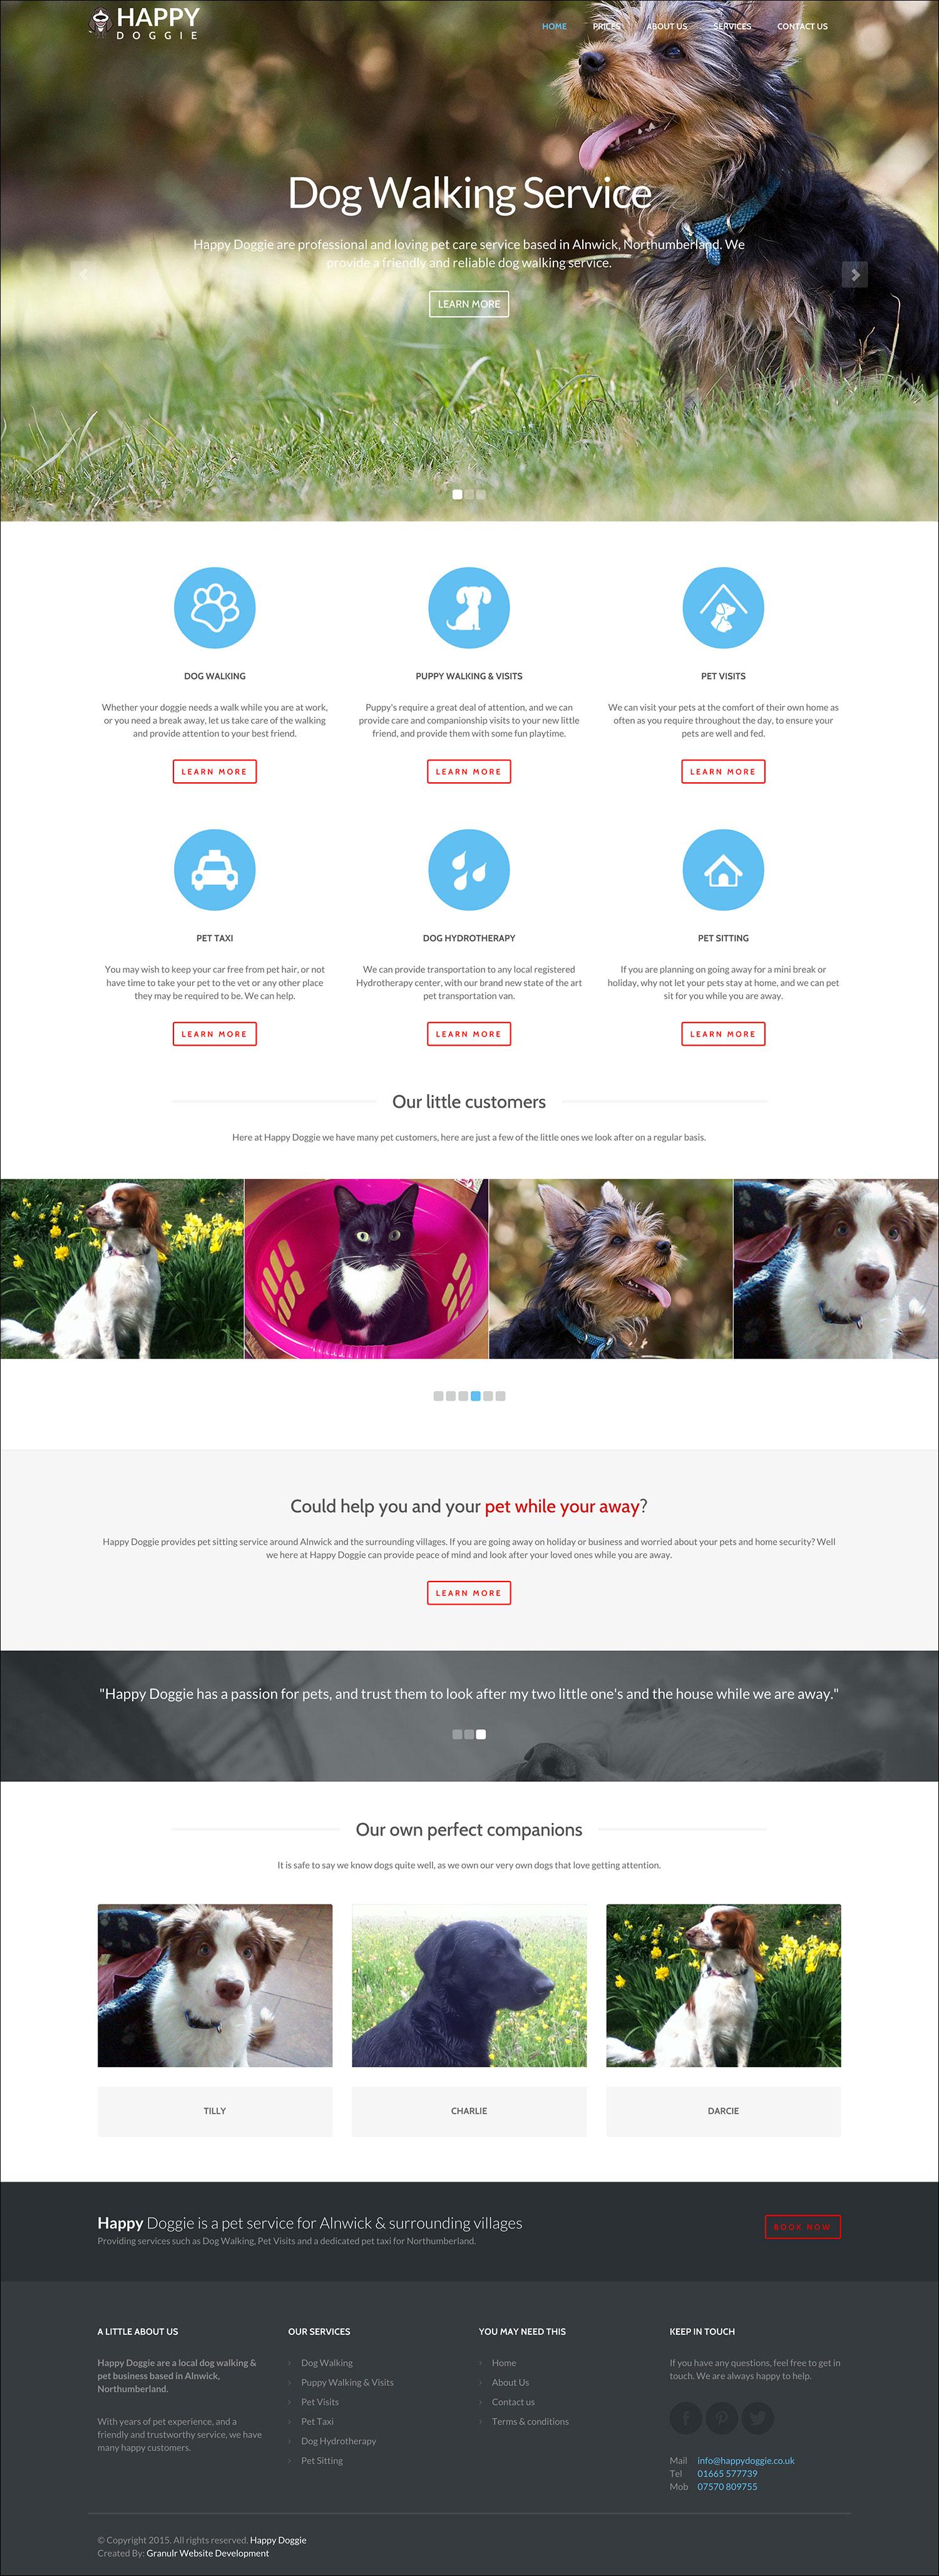 Happy Doggie Website By Granulr